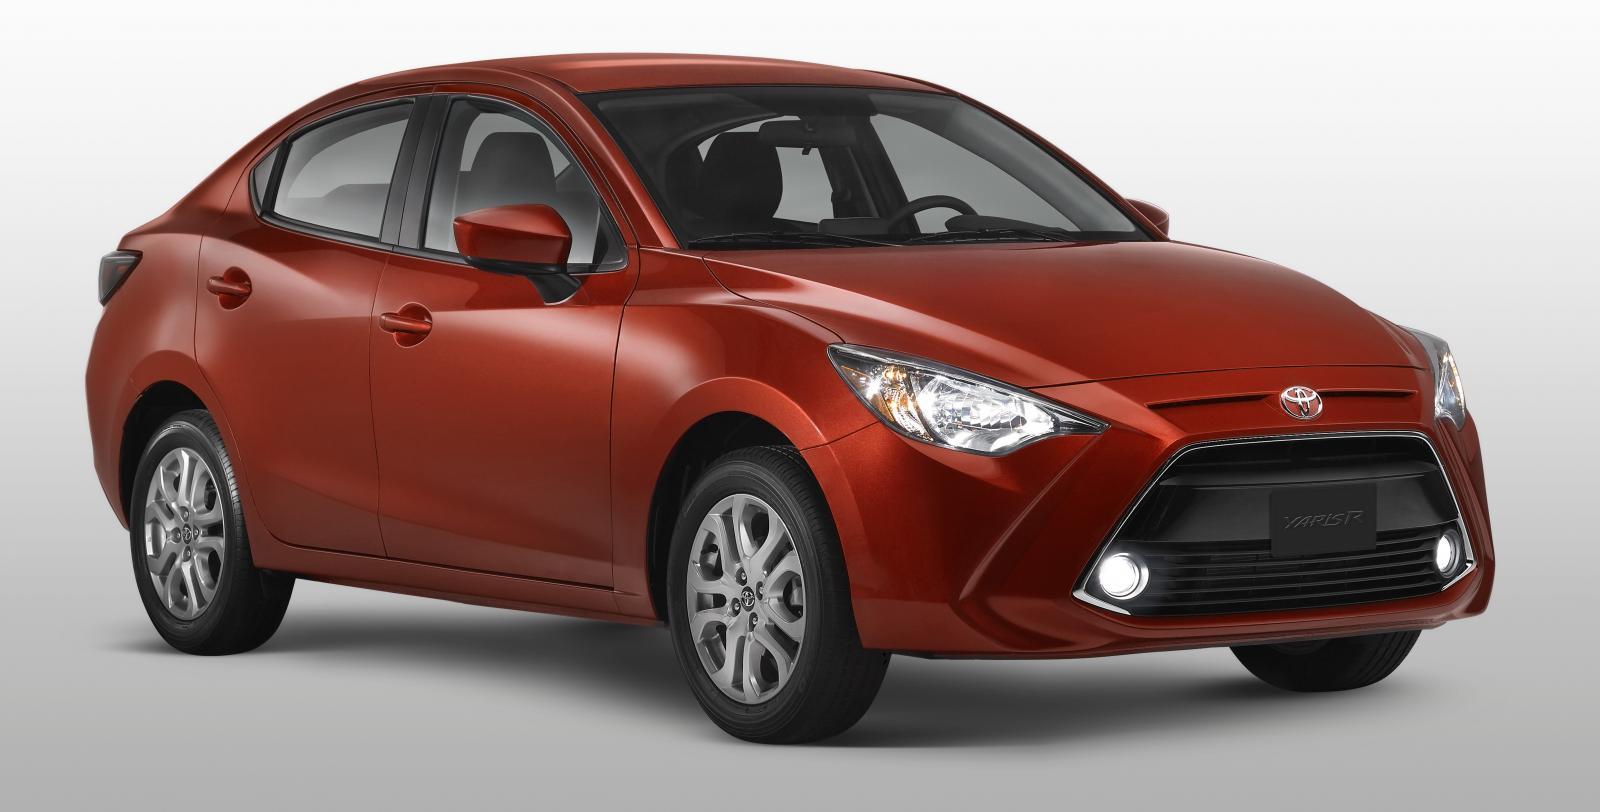 Toyota Yaris R 2019: Ventajas y Desventajas